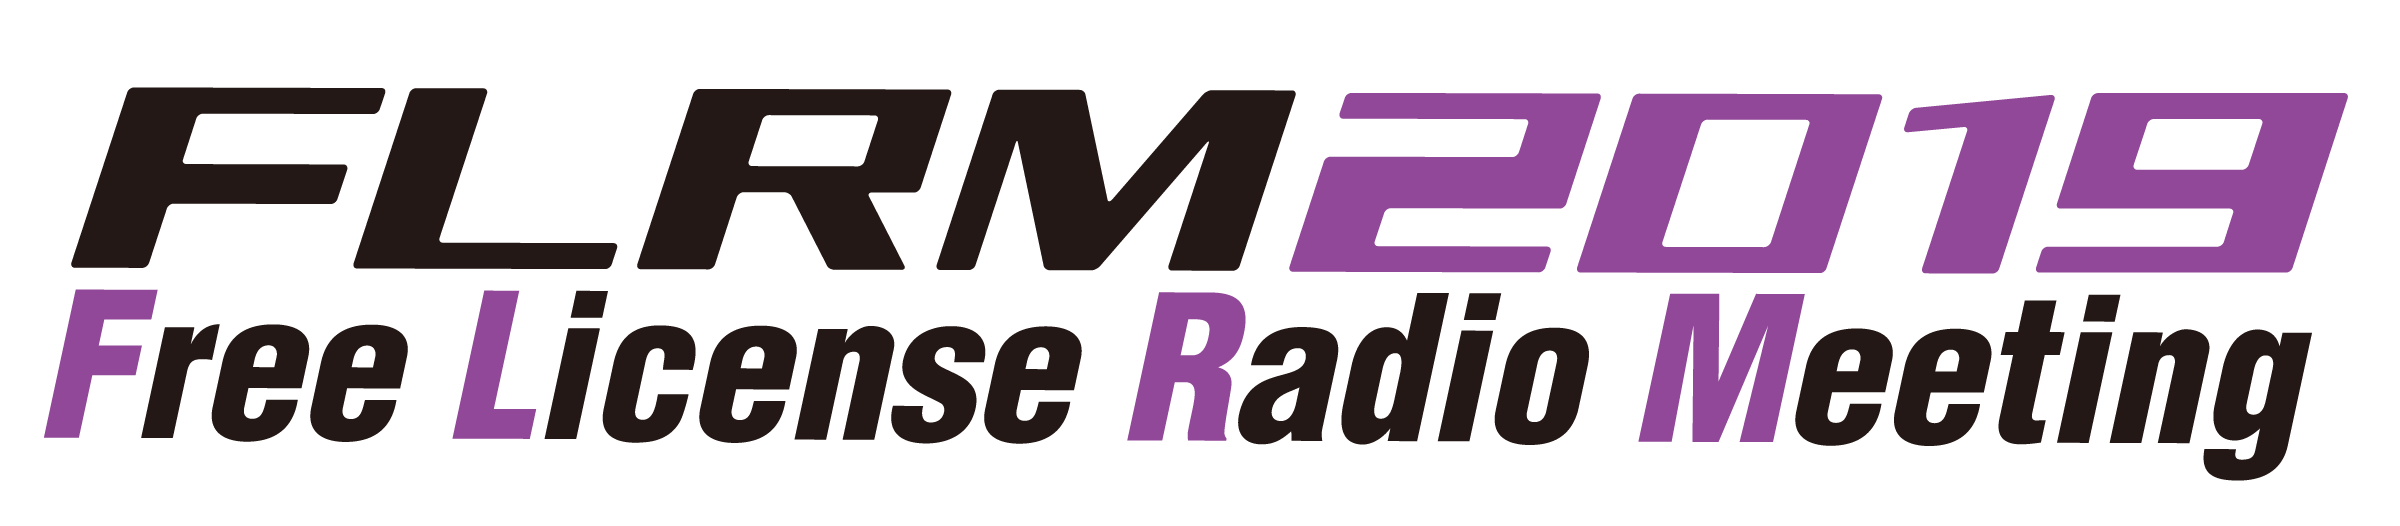 FLRM ライセンスフリーラジオ(フリラ)のミーティングイベント